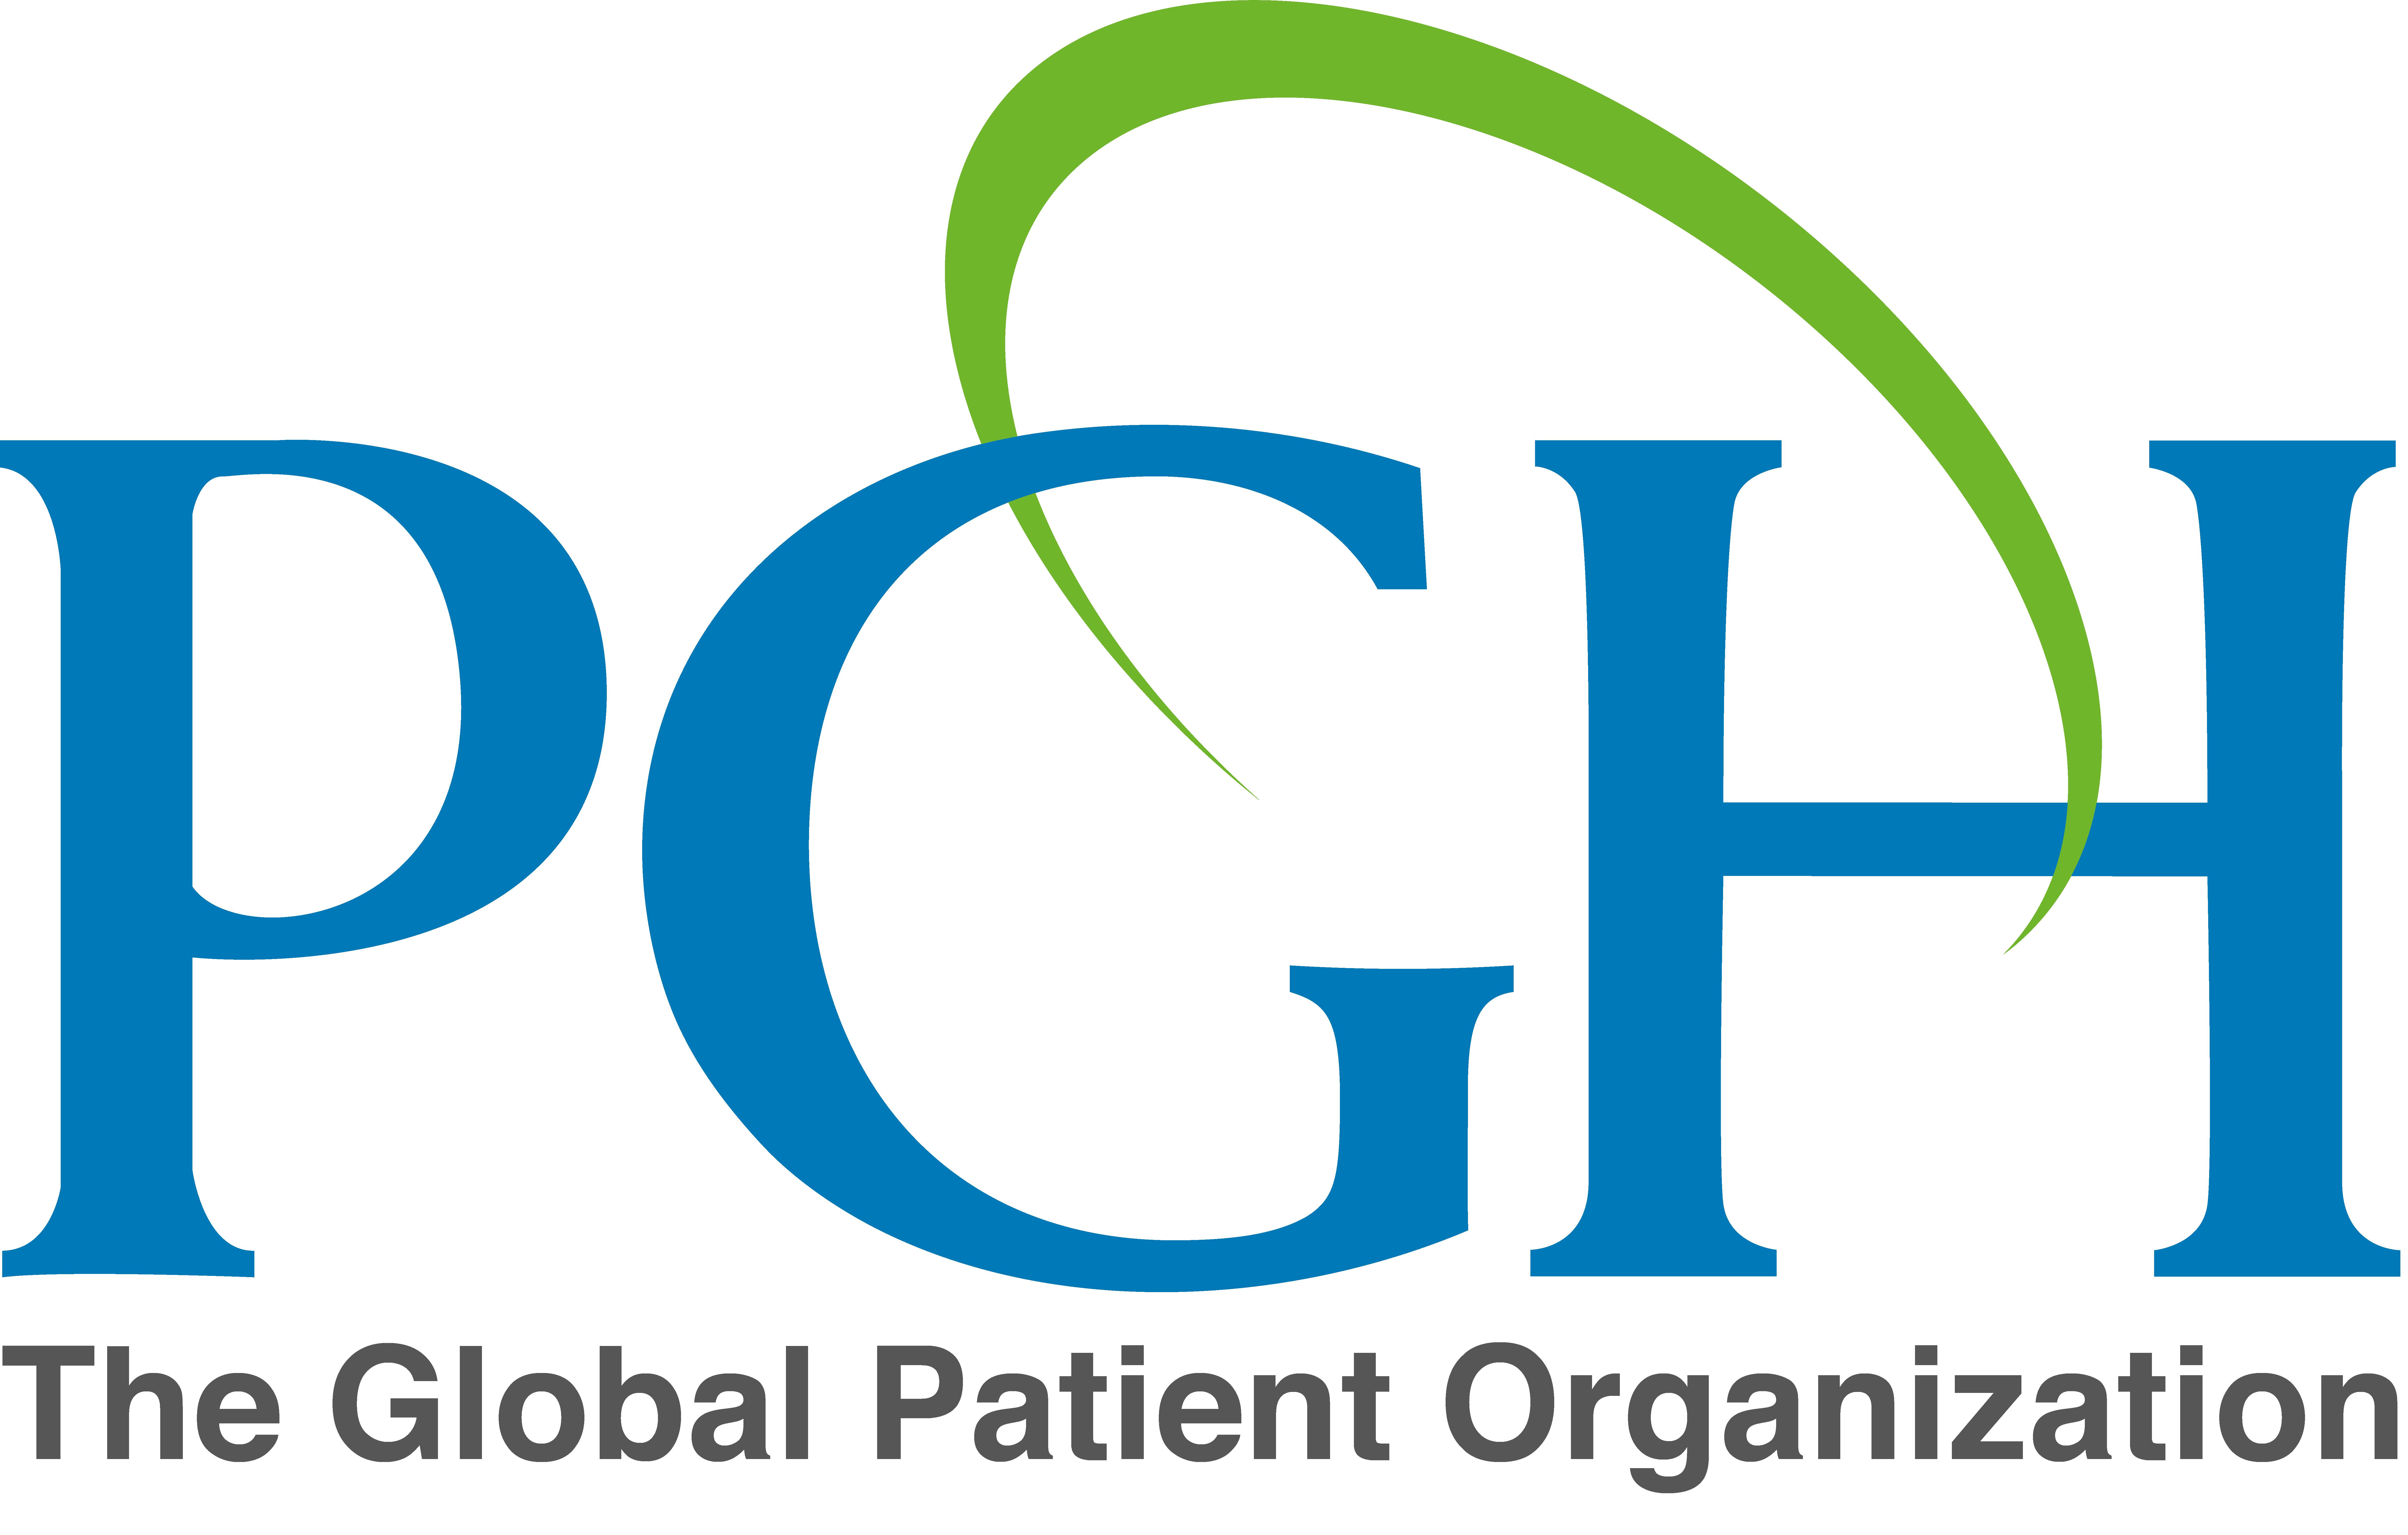 PGH_logo_21_A3